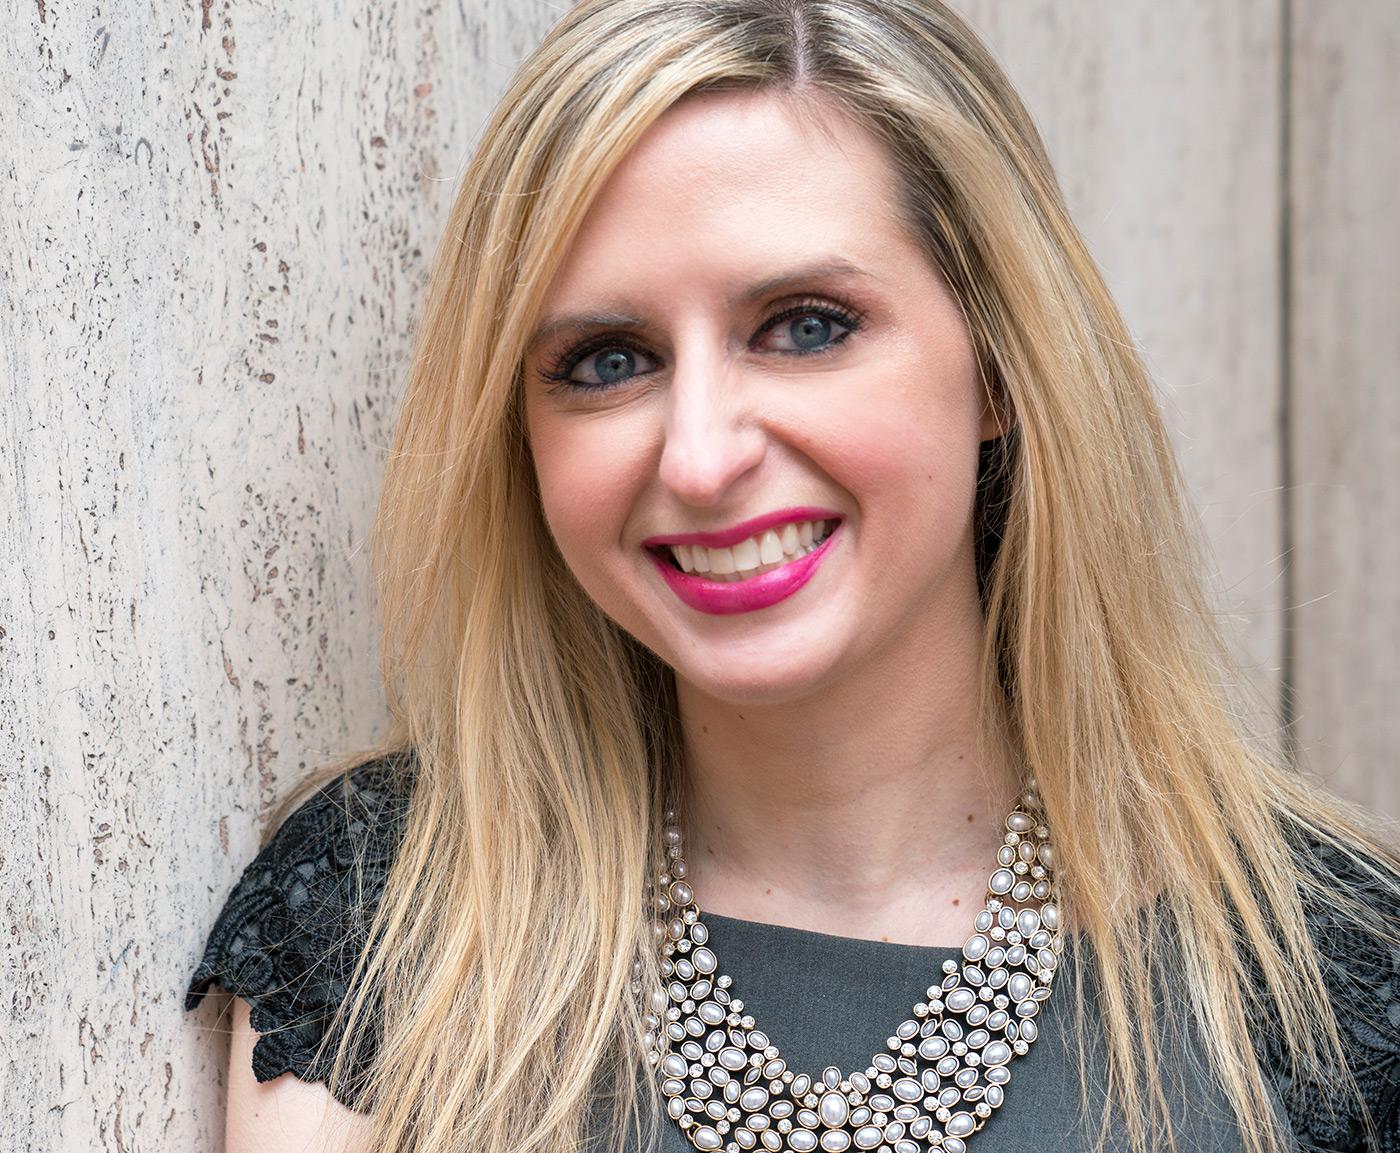 A.wordsmith Welcomes Lisa Hildebrandt as Senior Manager